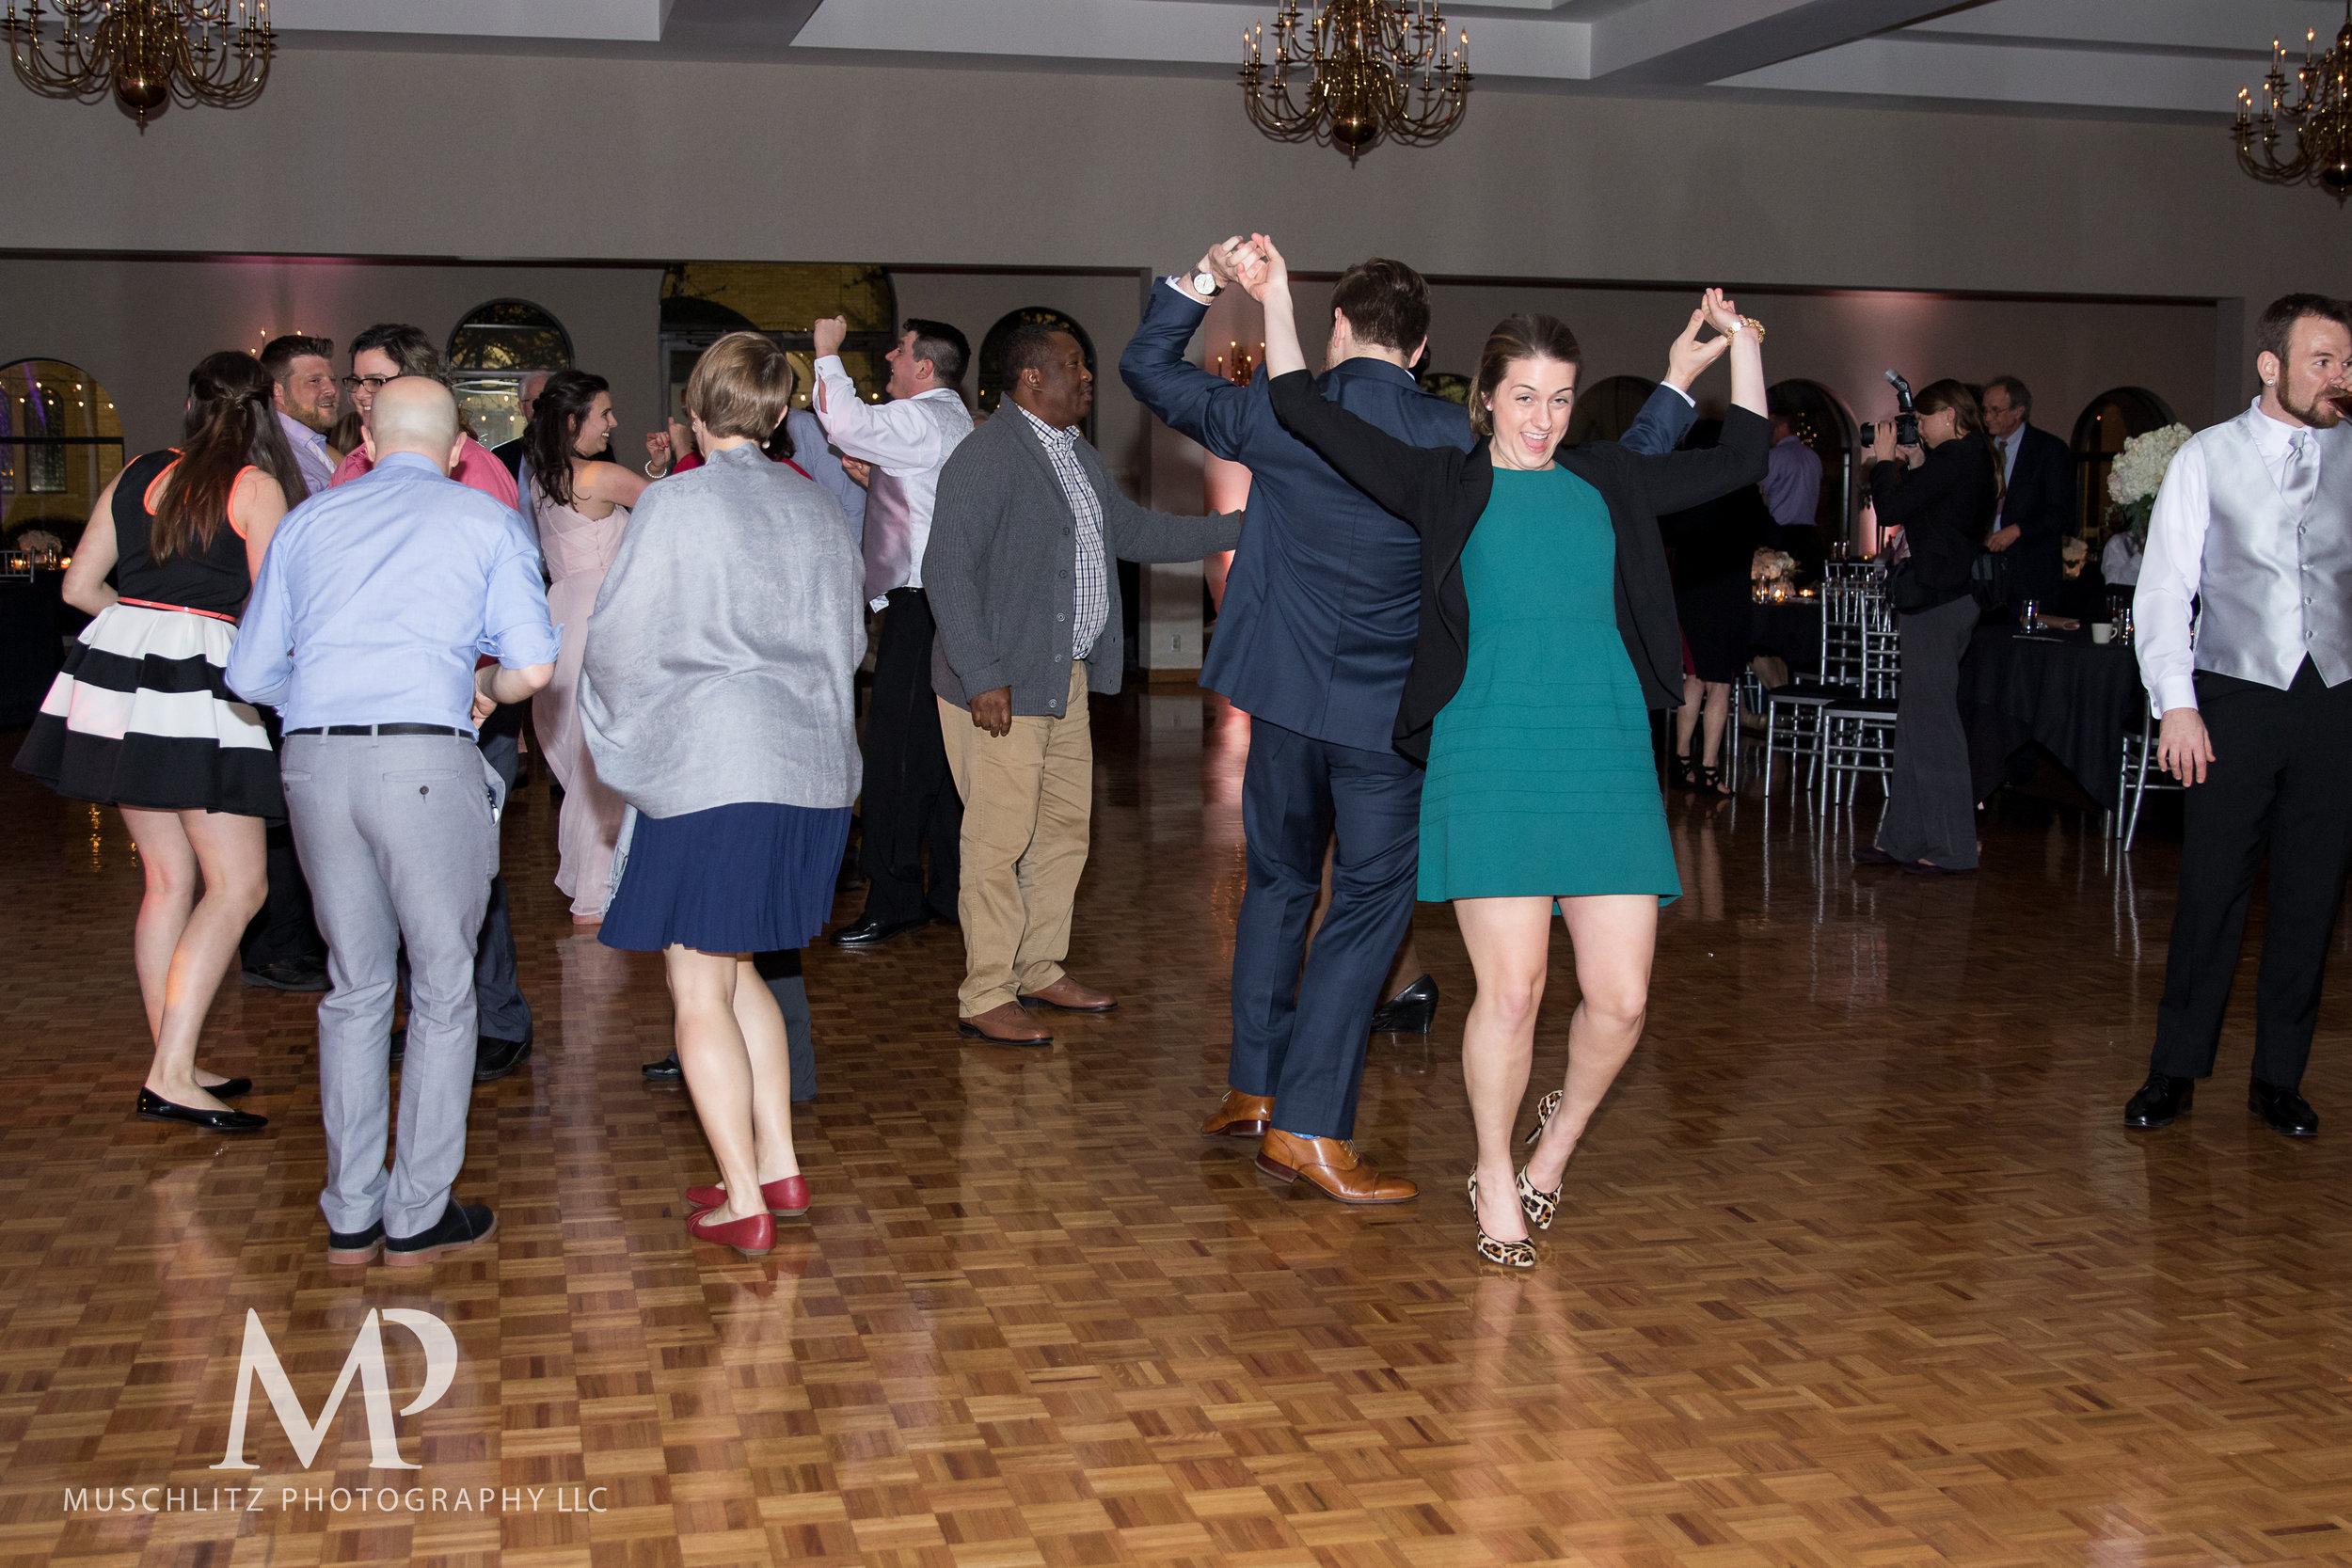 annunciation-banquet-conference-center-downtown-columbus-wedding-reception-downtown-columbus-ohio-muschlitz-photography-030.JPG